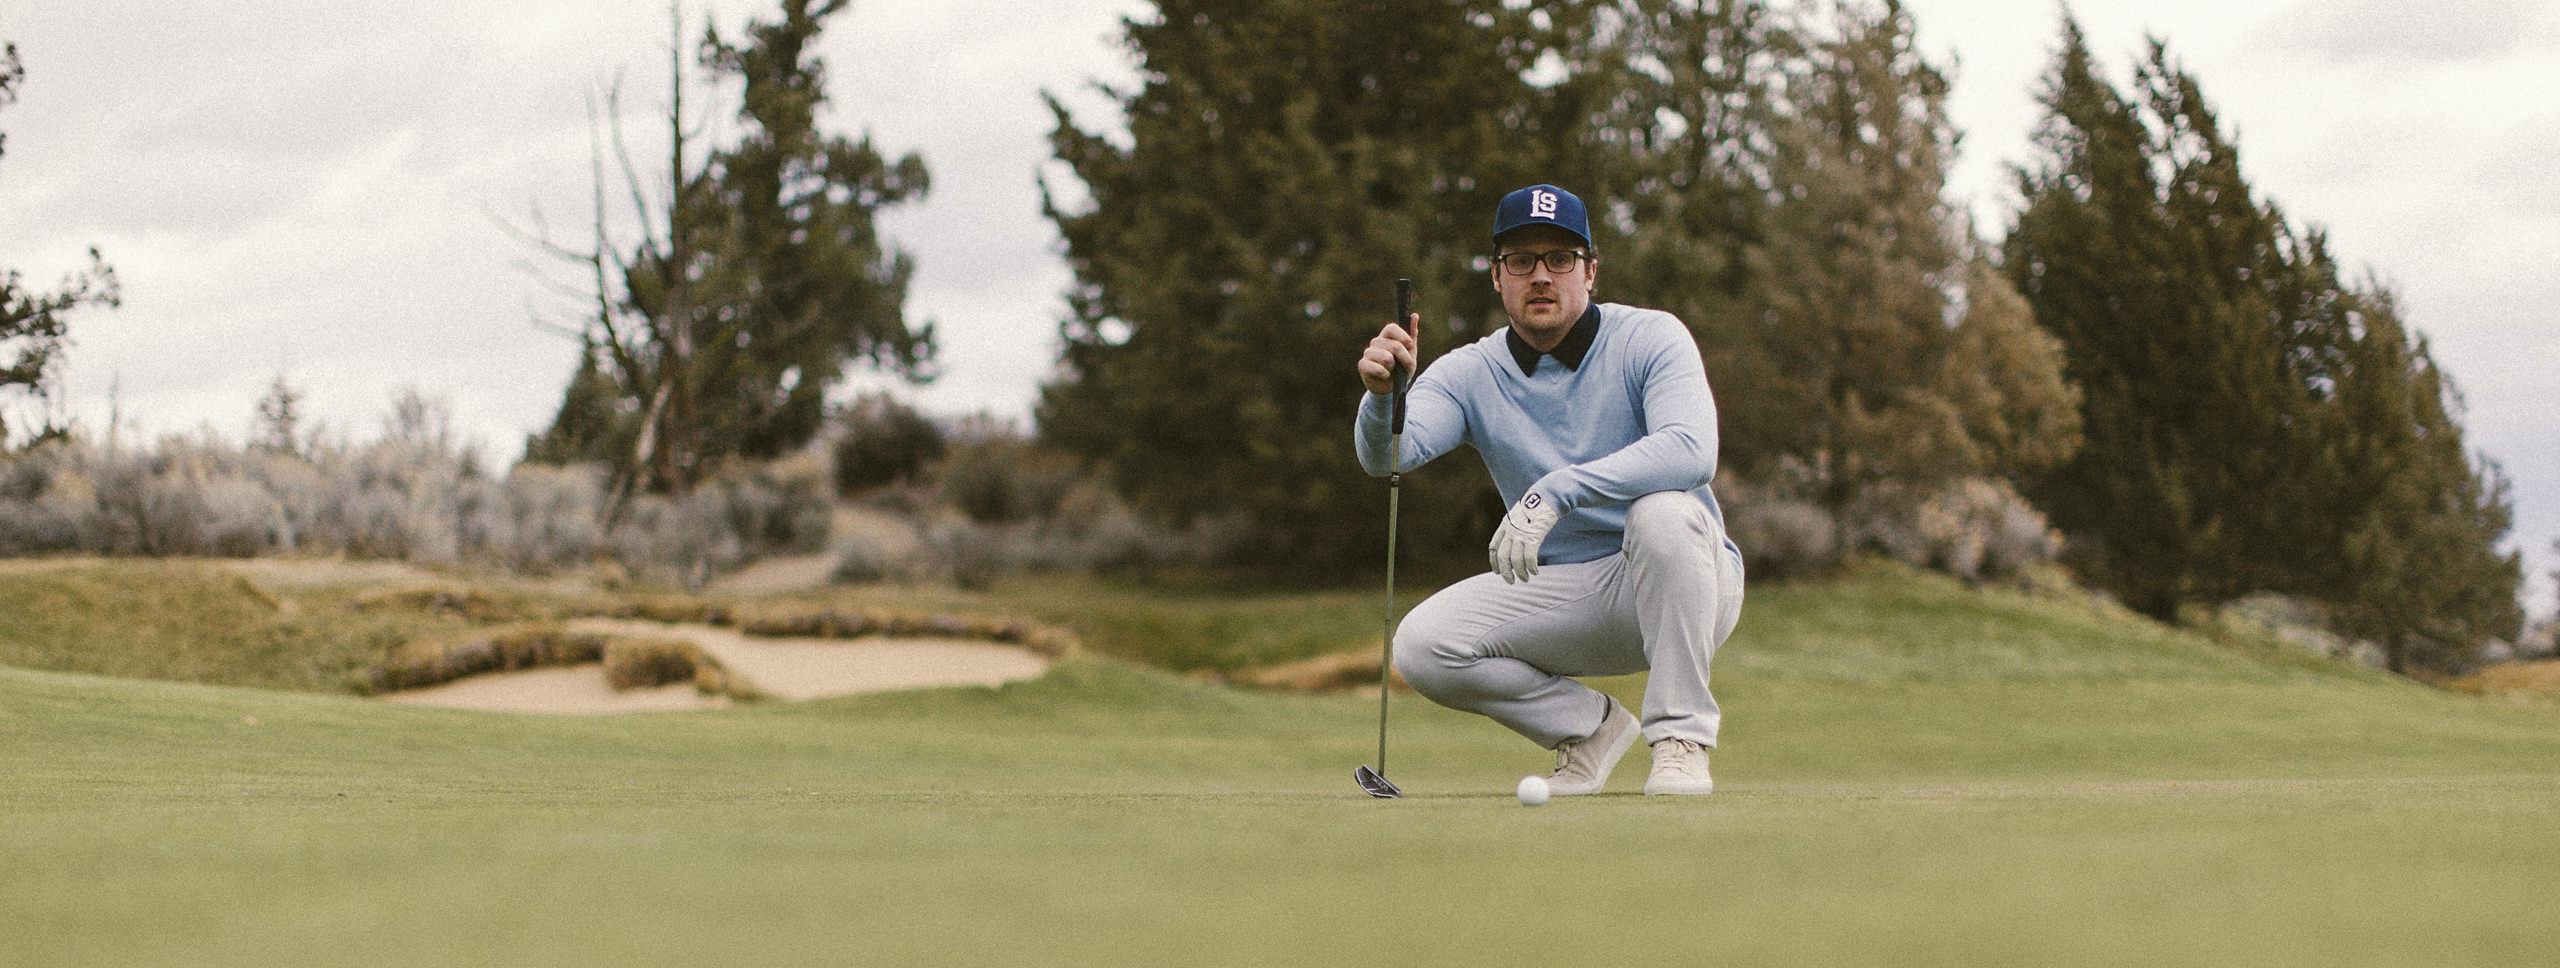 Ian-Golf-Resized-101